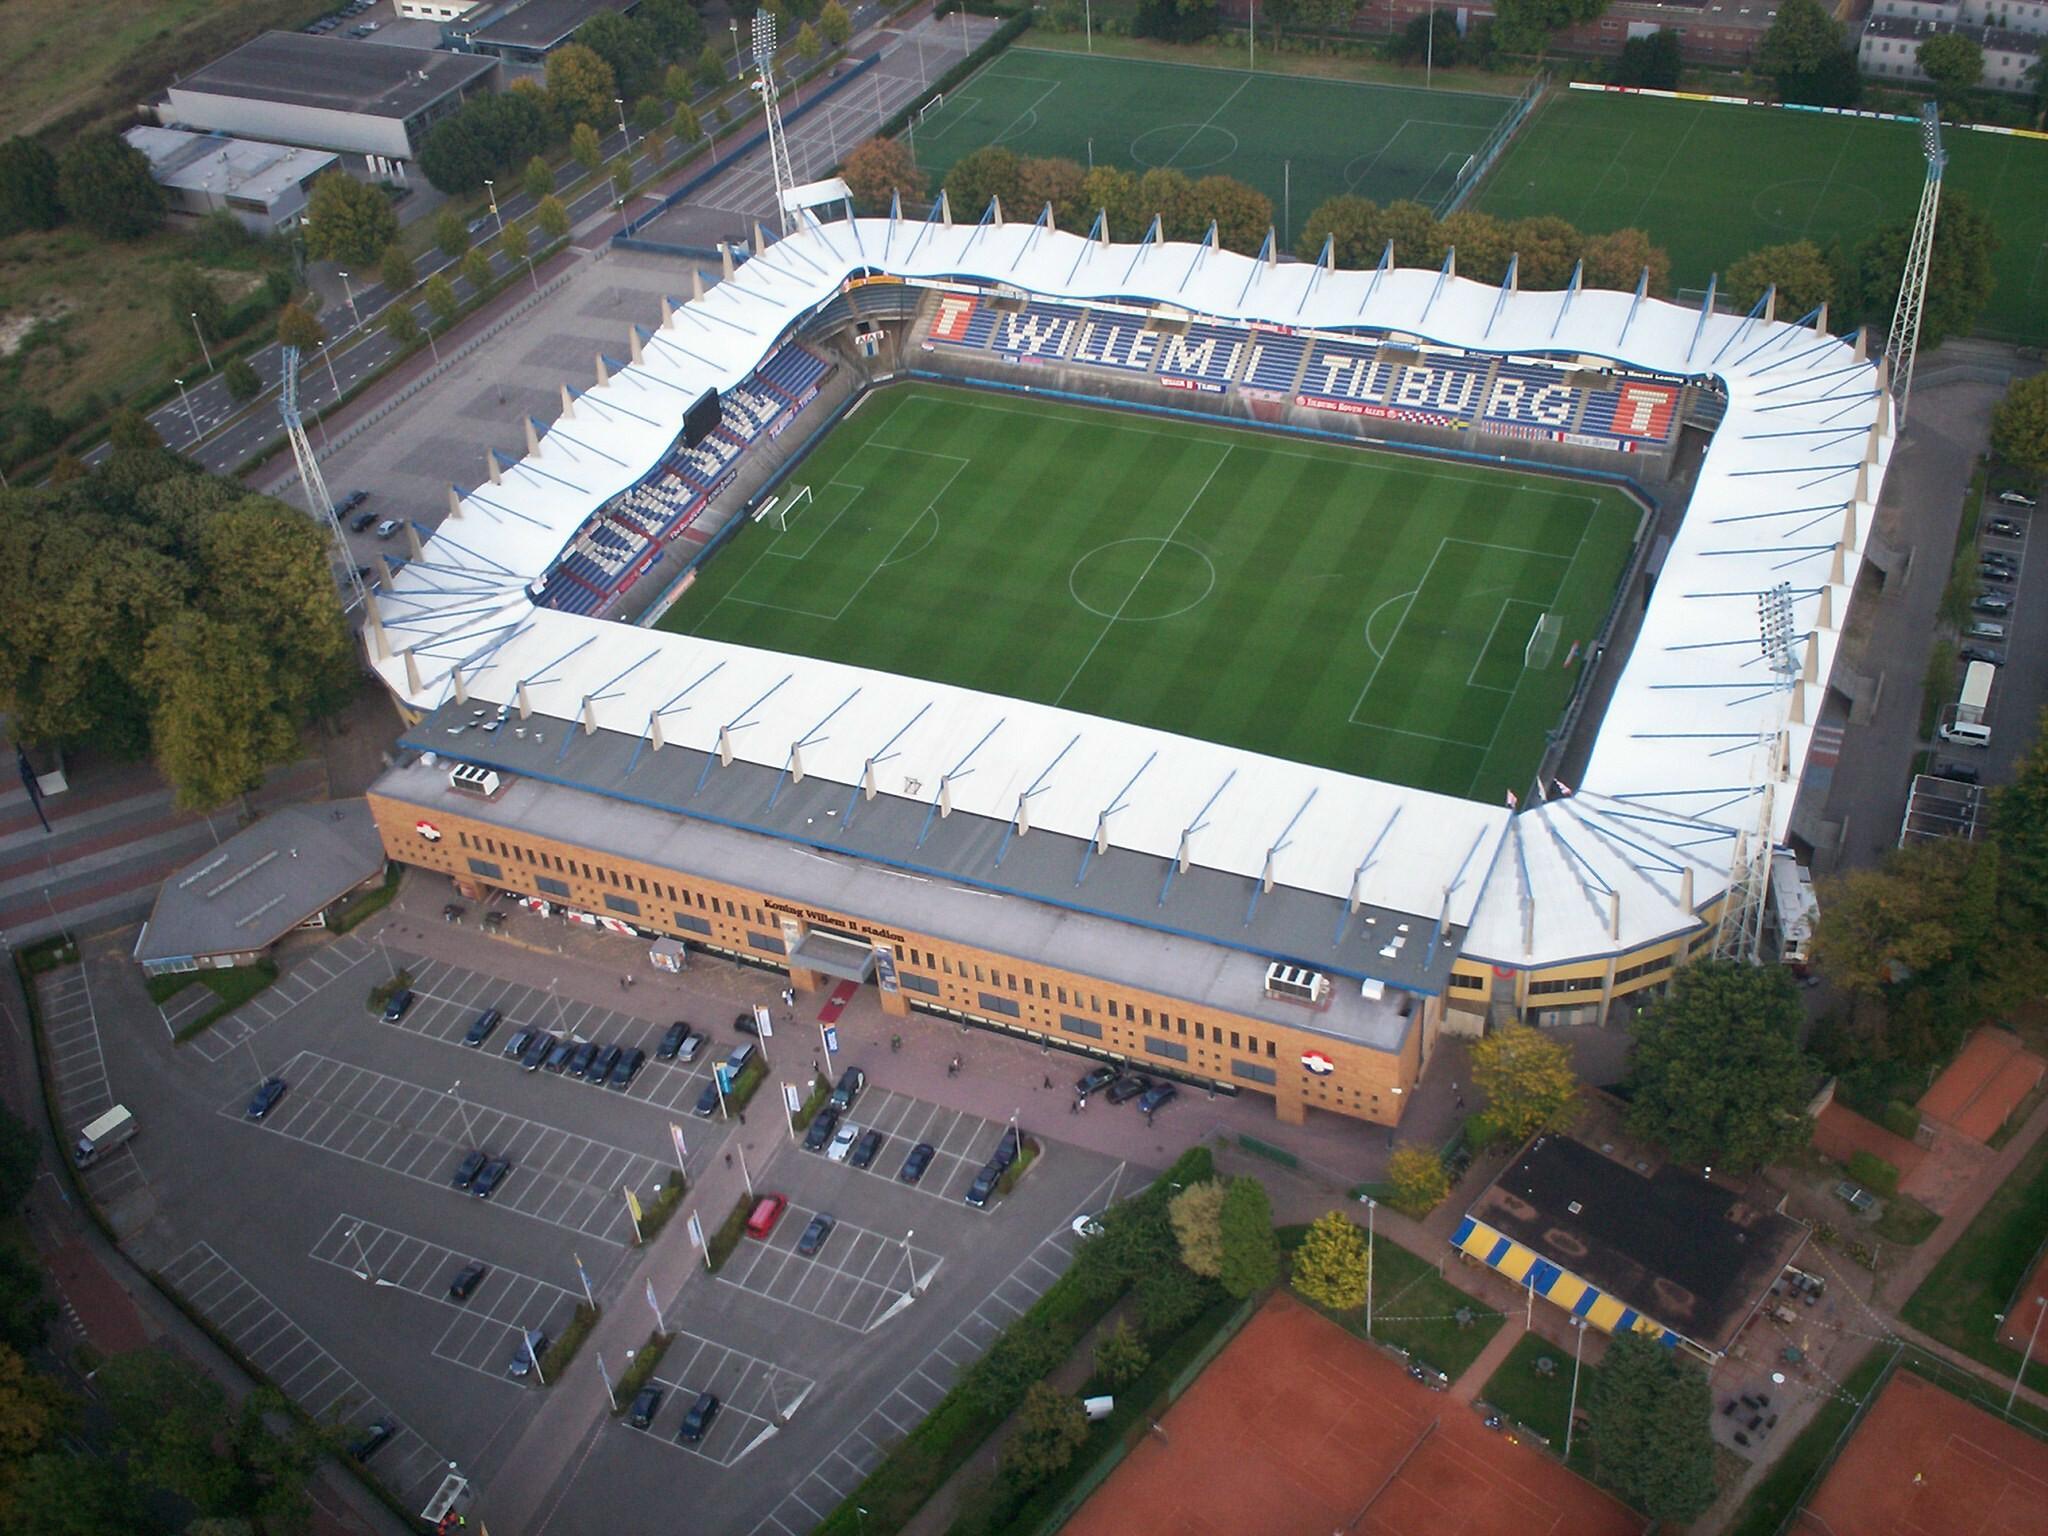 https://scale.lwcdn.nl/imageScaled/?site=sportbedrijf&file=1557221893_WillemIIstadion-2.jpg